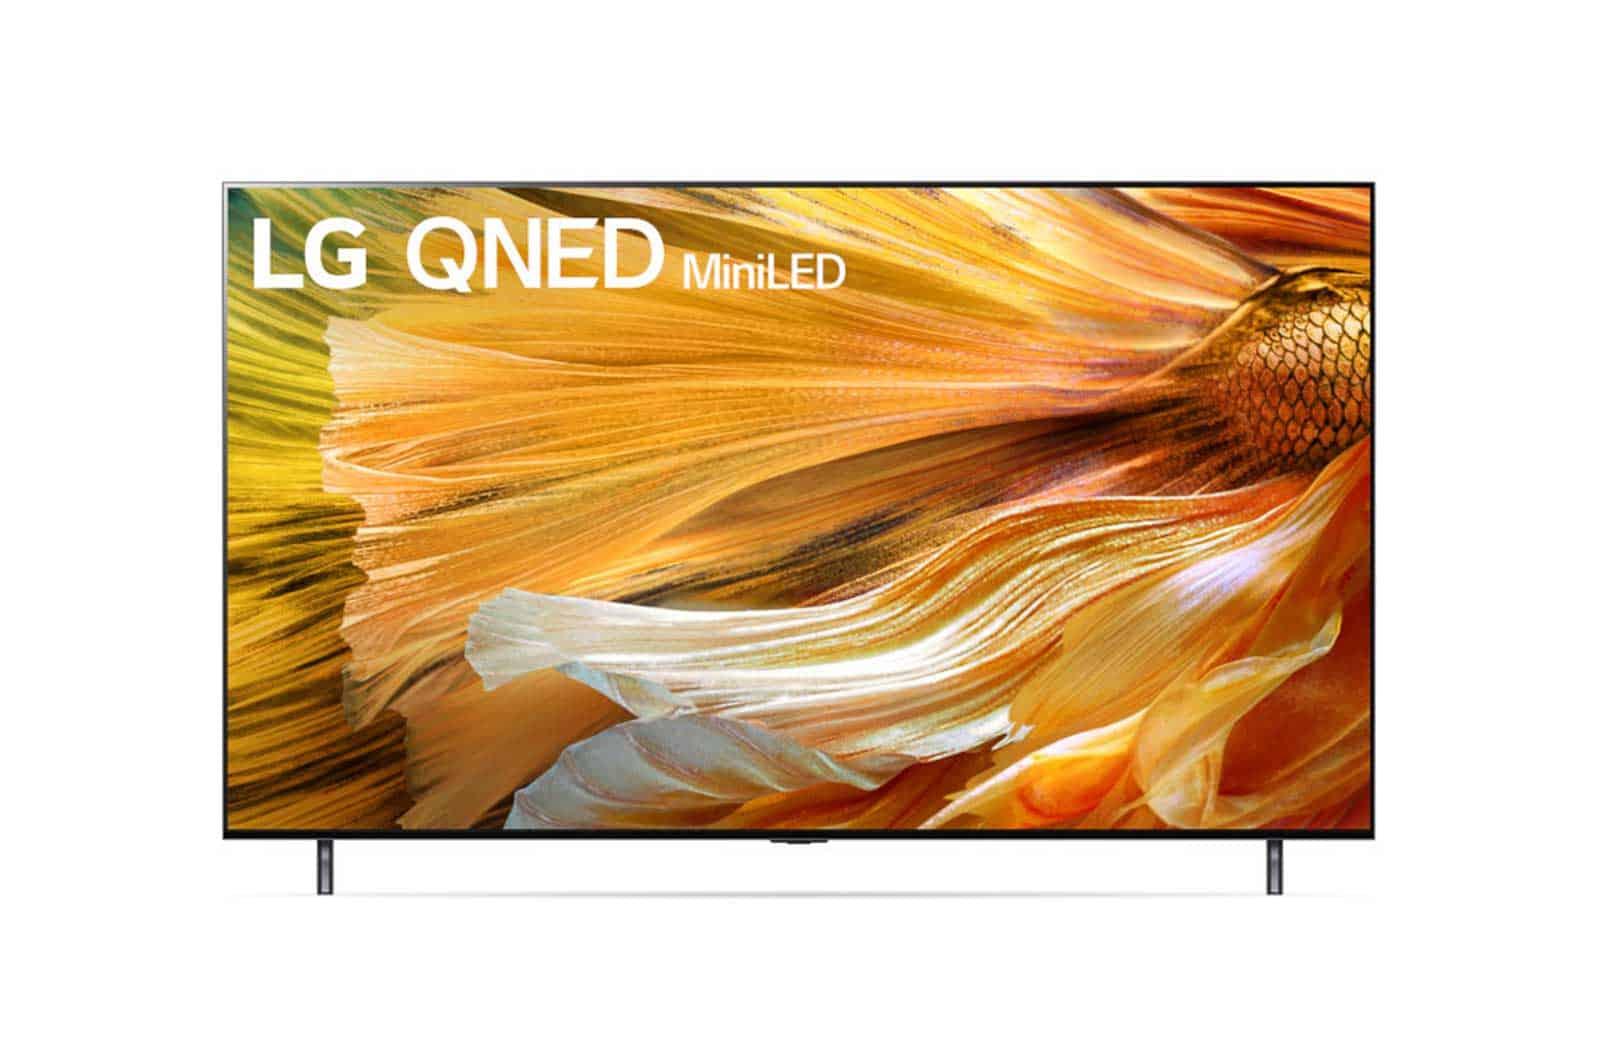 LG Mini DEL QNED90 4K Téléviseur Intelligent de 86 po (86QNED90UPA)